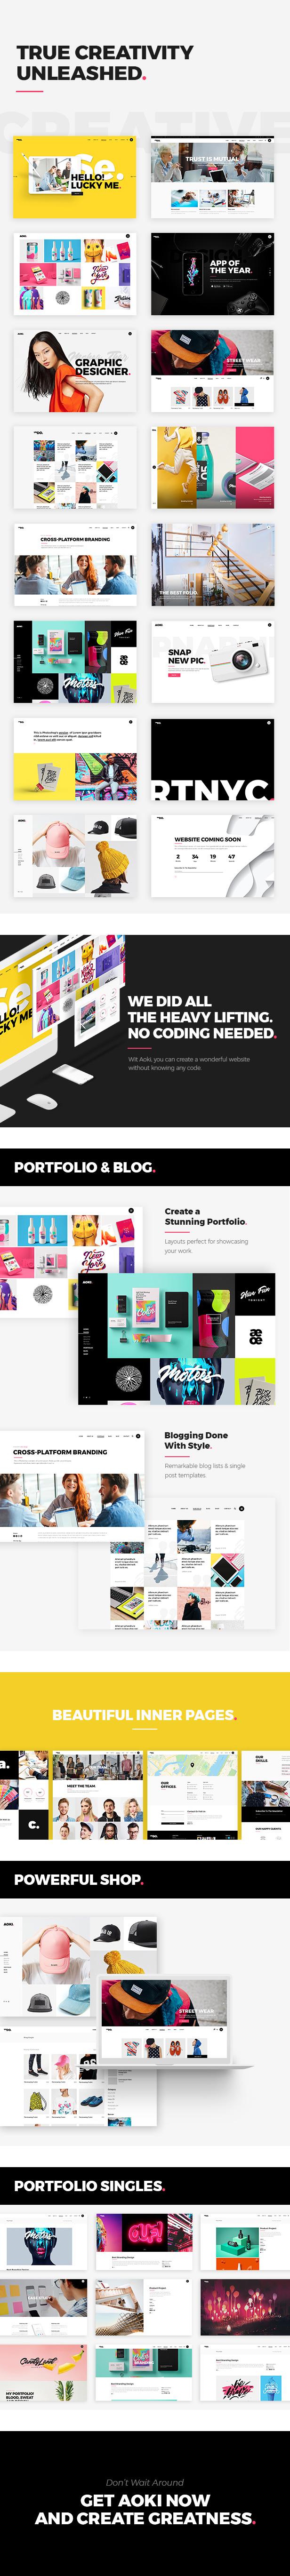 Aoki - Creative Design Agency Theme - 2